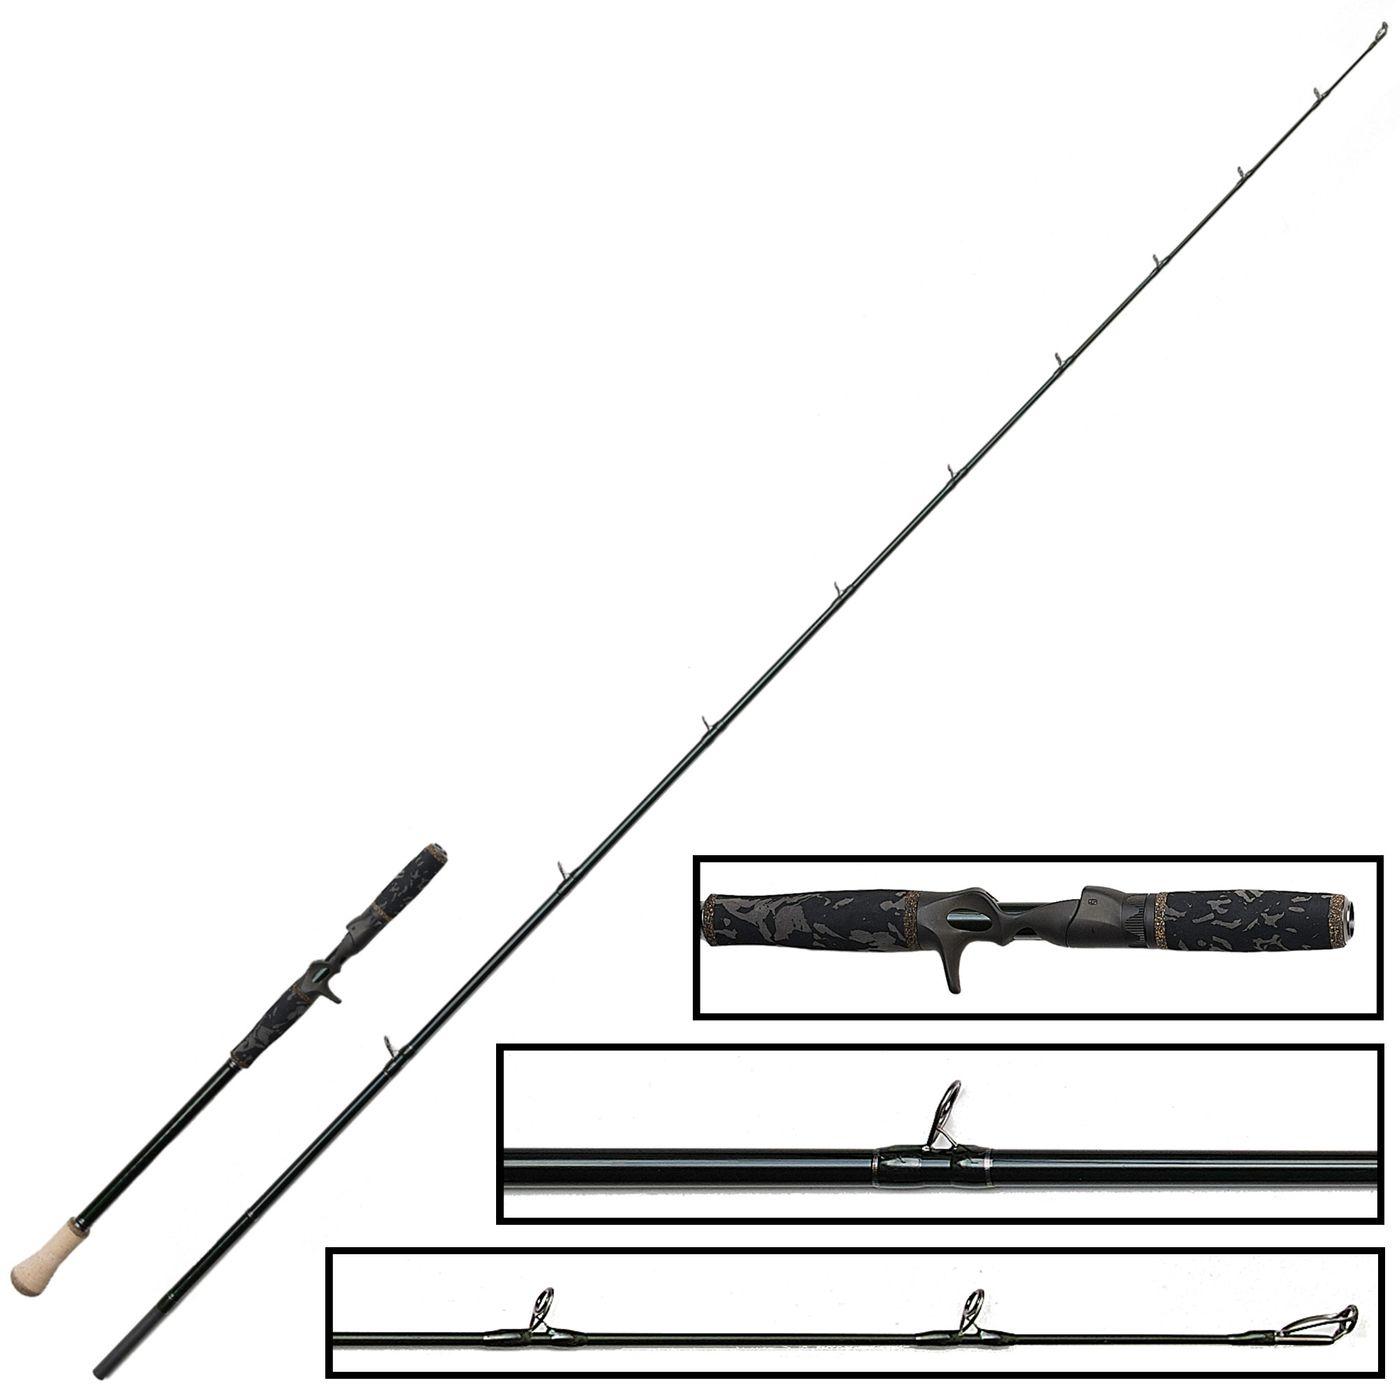 1DFR 7ft11in Trigger 238cm />170g 2 Teile Savage Gear Baitcastrute